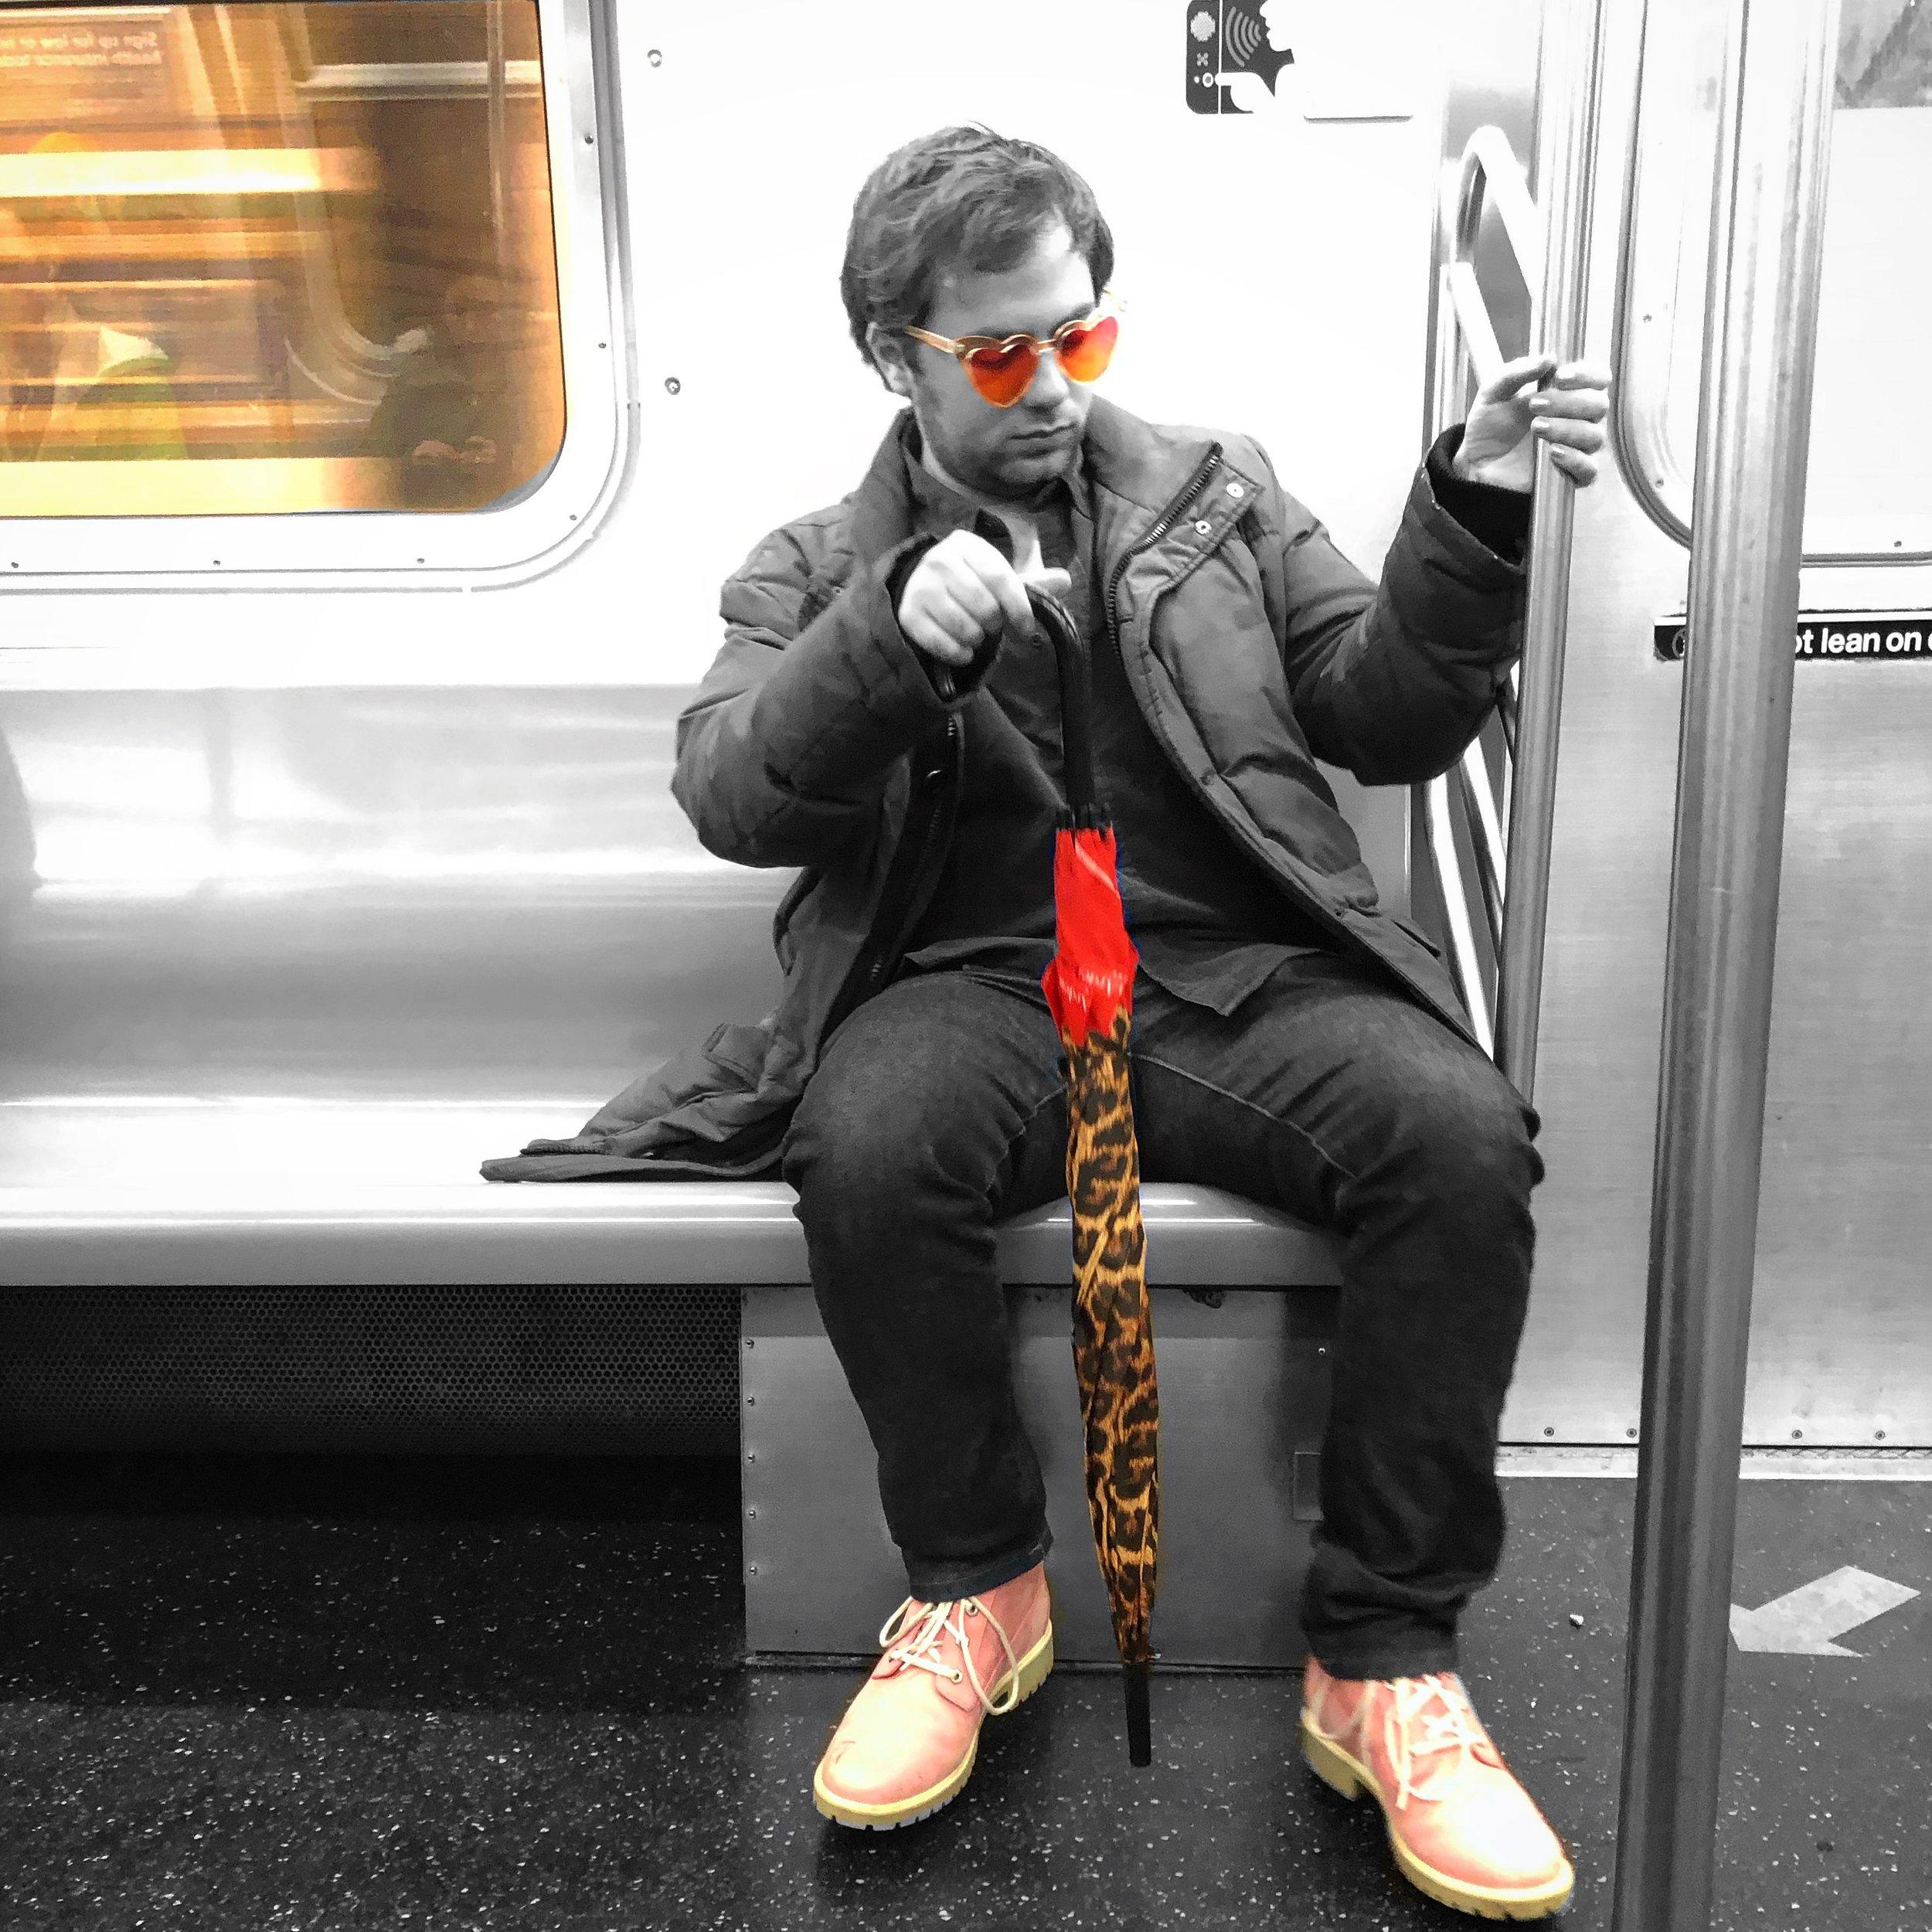 1/1/19 1:19am, Times Sq. MTA